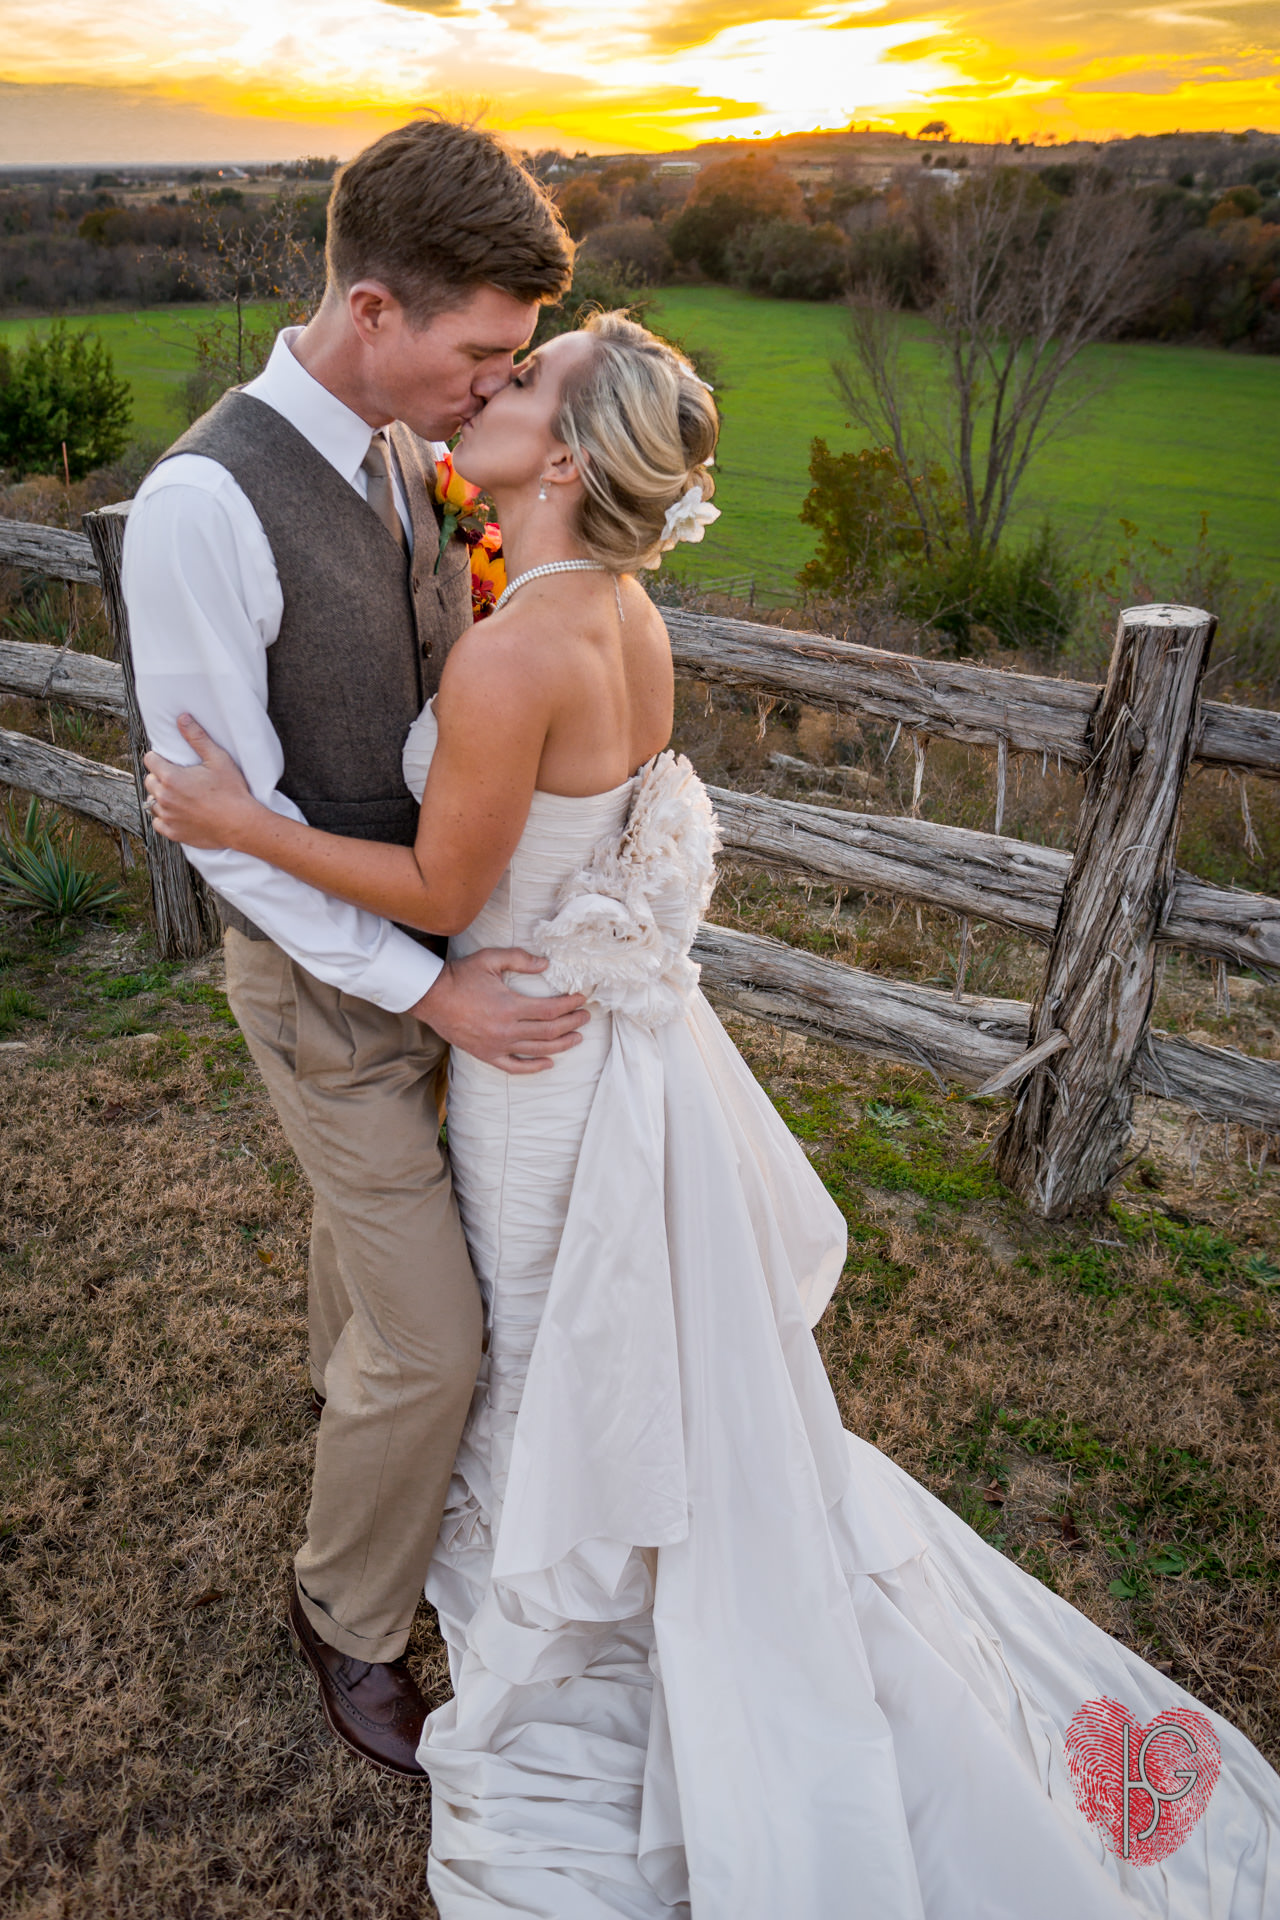 weatherford-wedding-photography-65.jpg